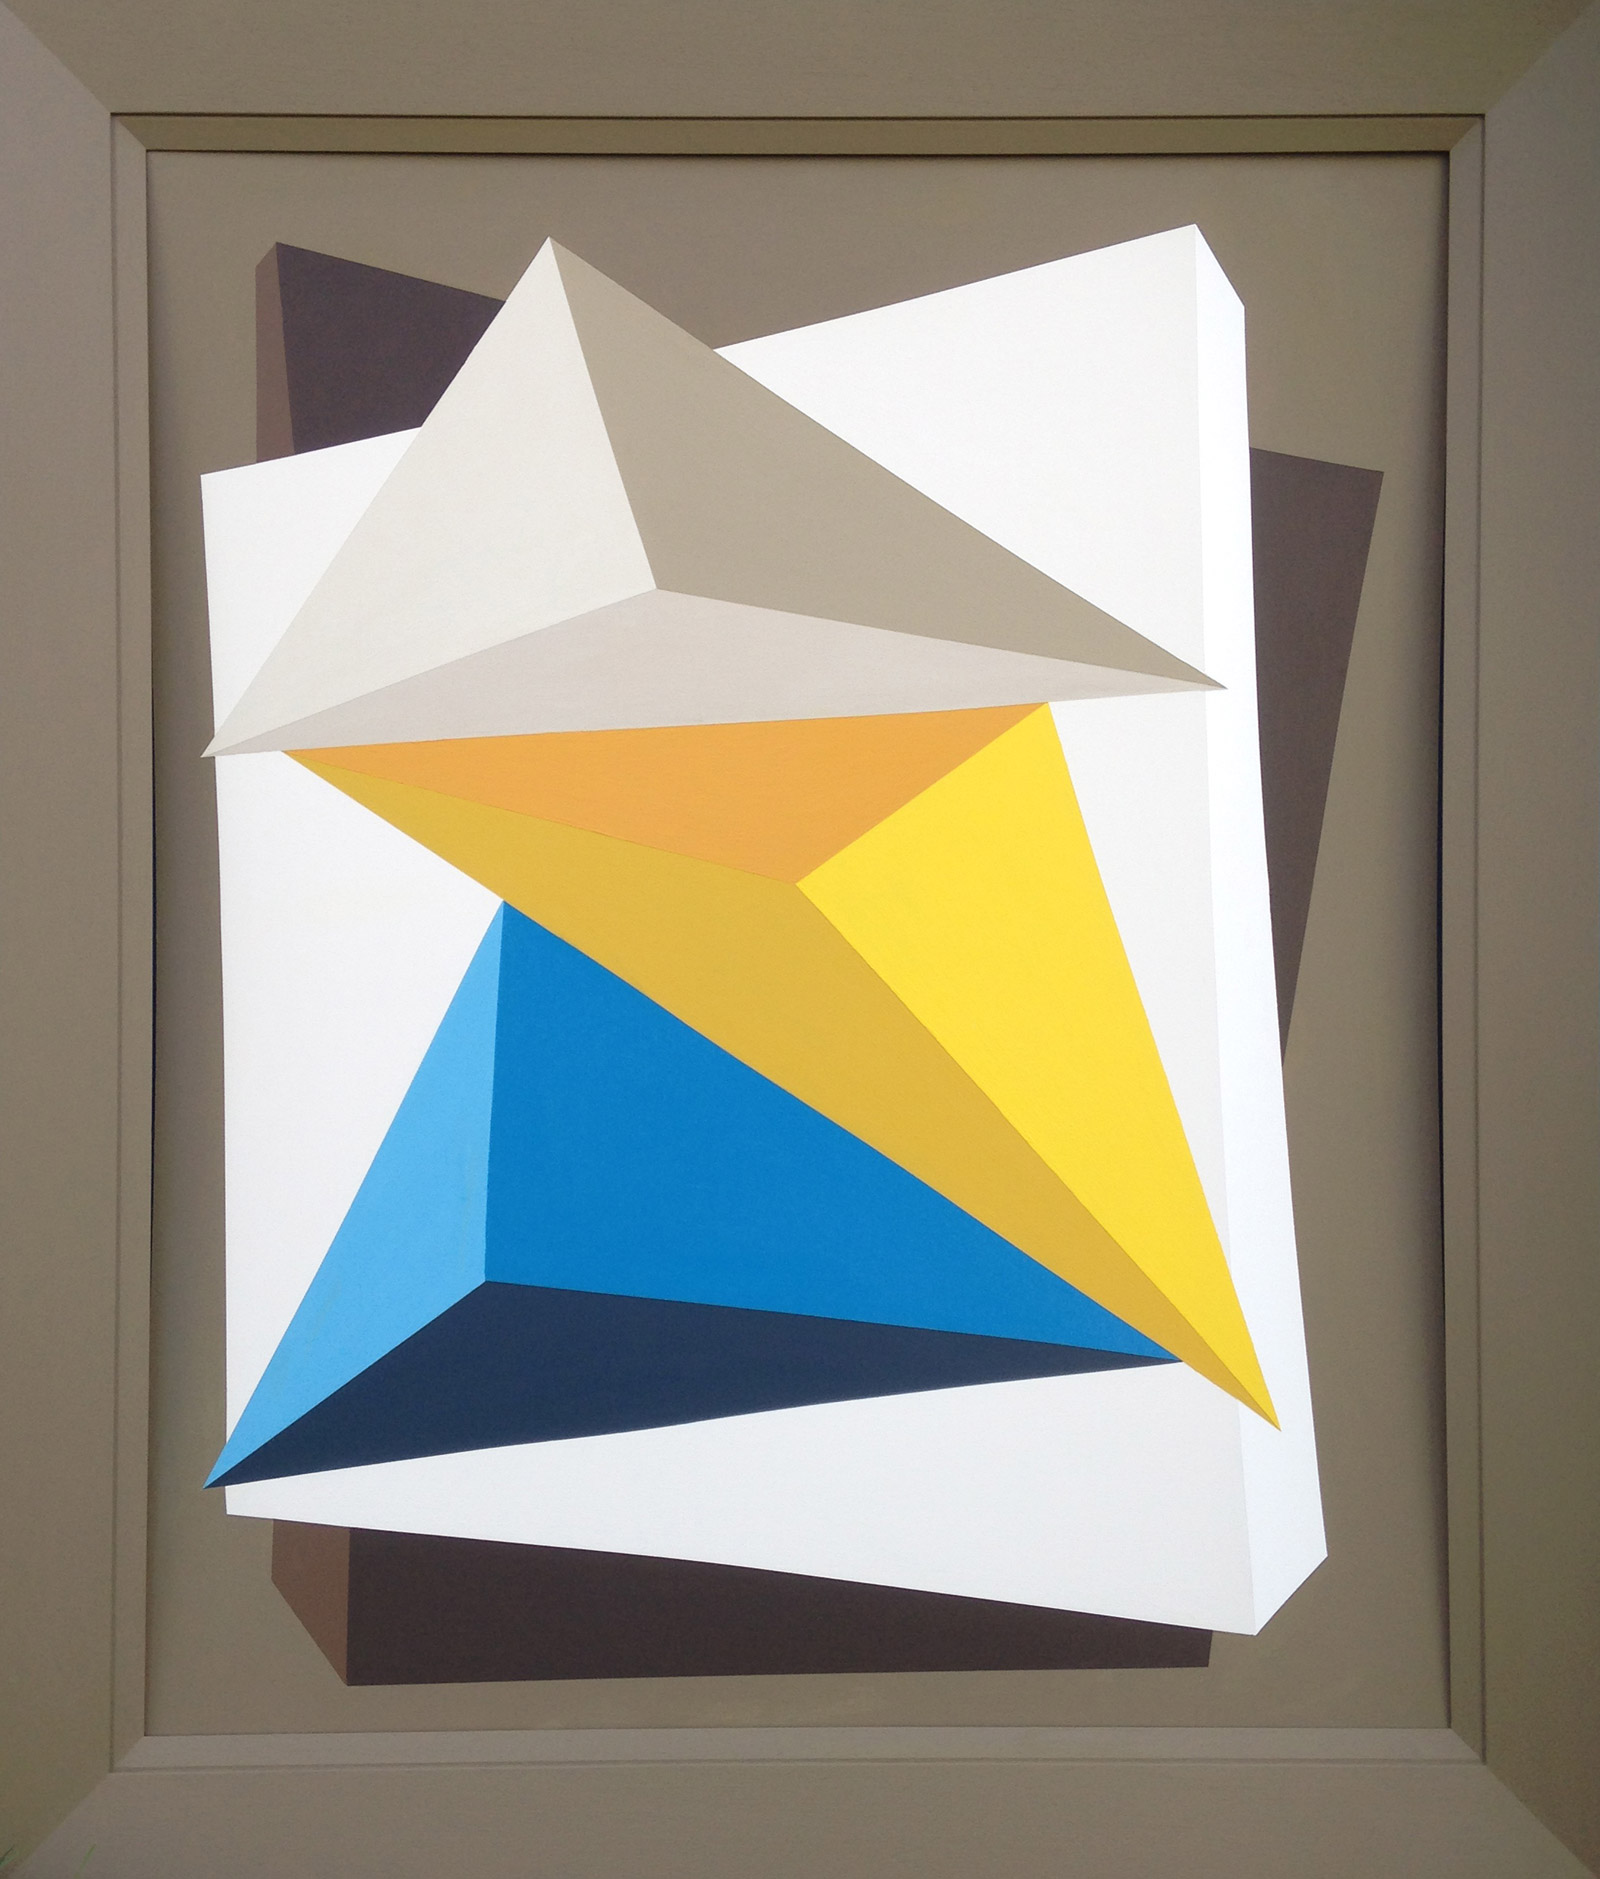 Overlaid Prisms